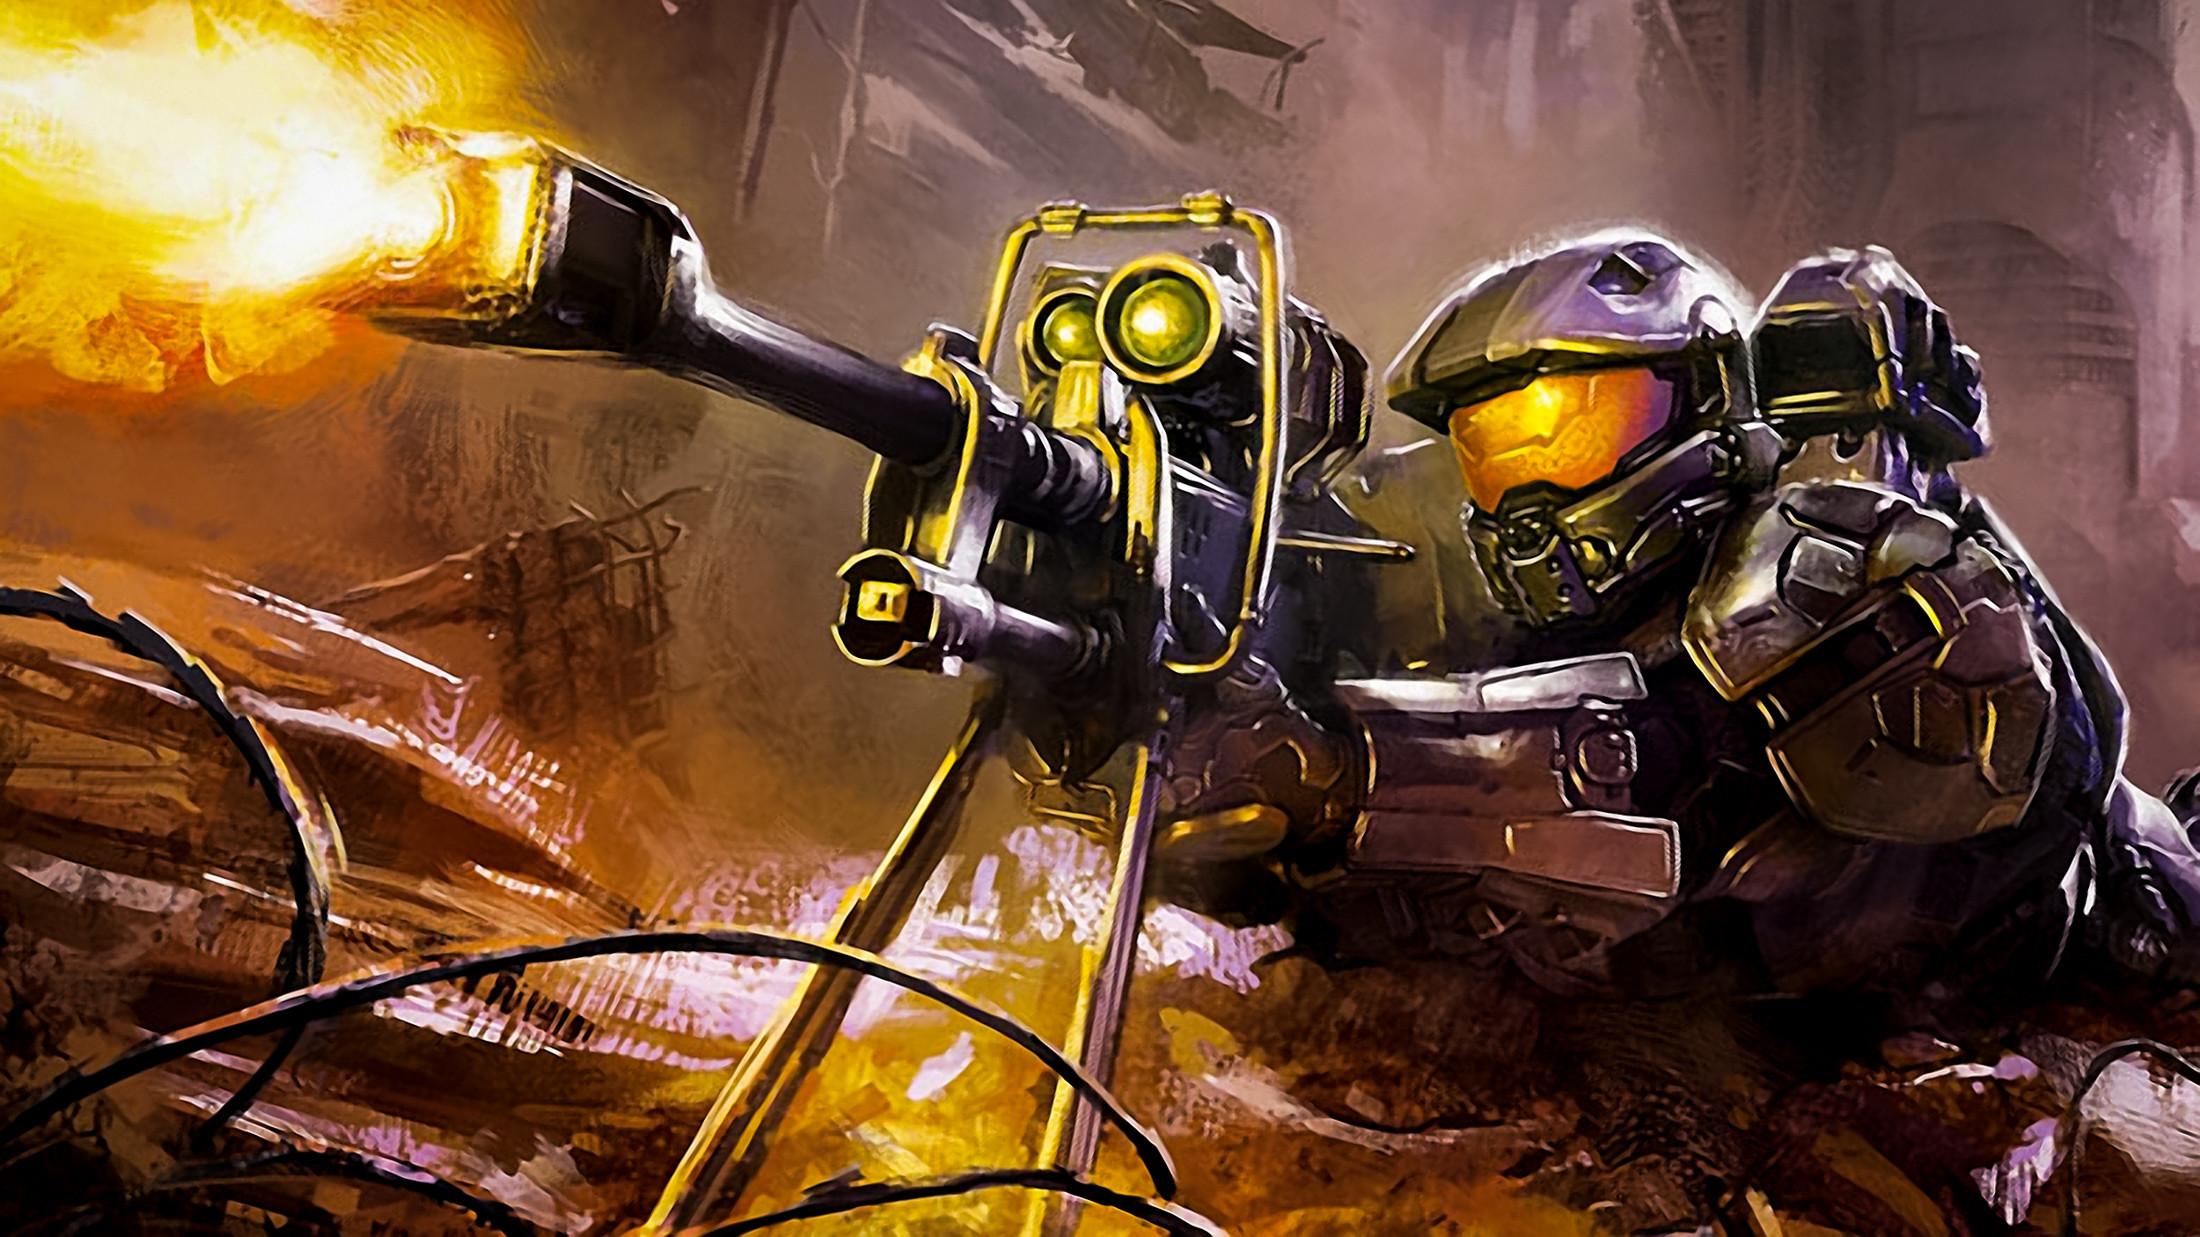 Halo 5 Arbiter Wallpaper (85+ images)